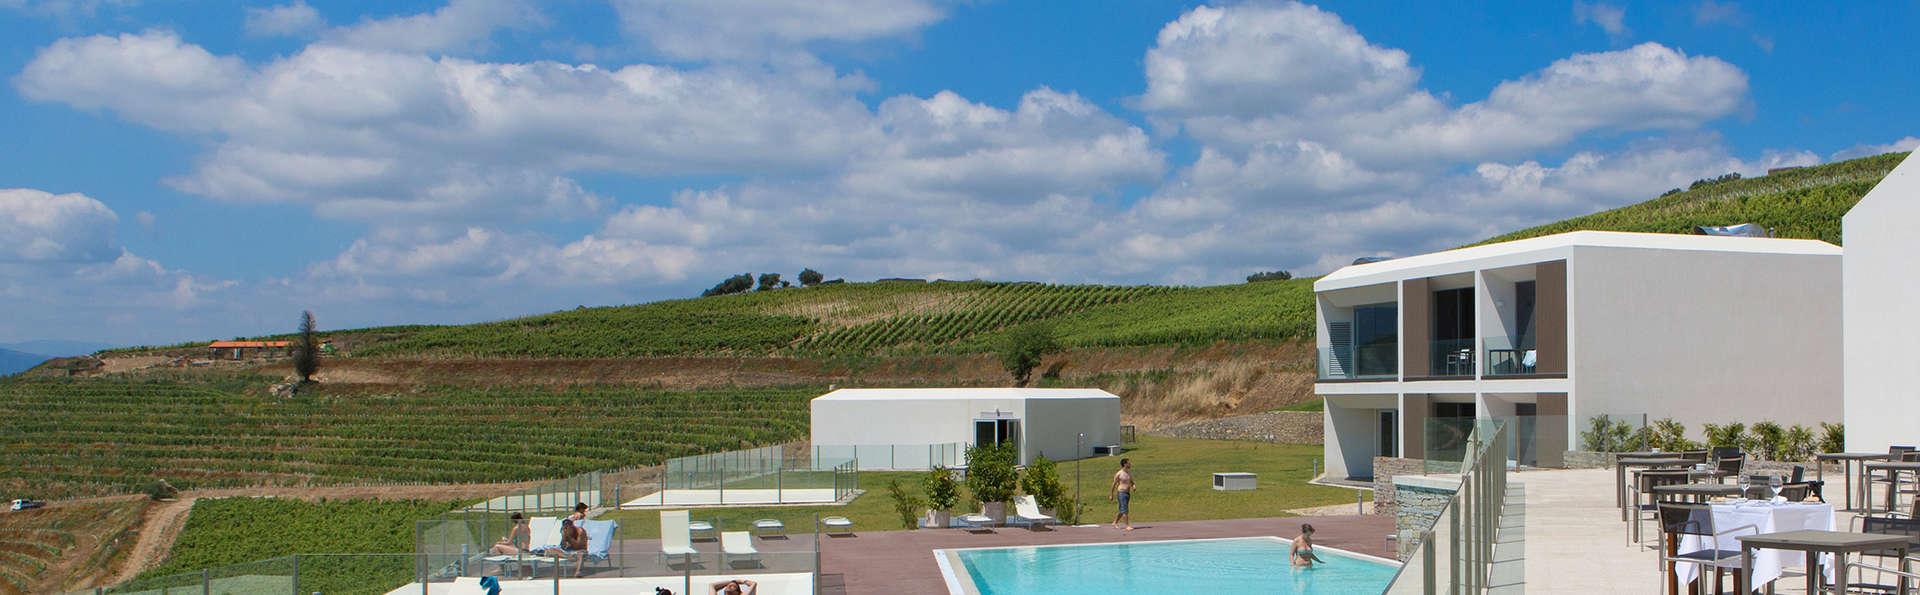 Hotel Douro Scala - edit_pool1.jpg